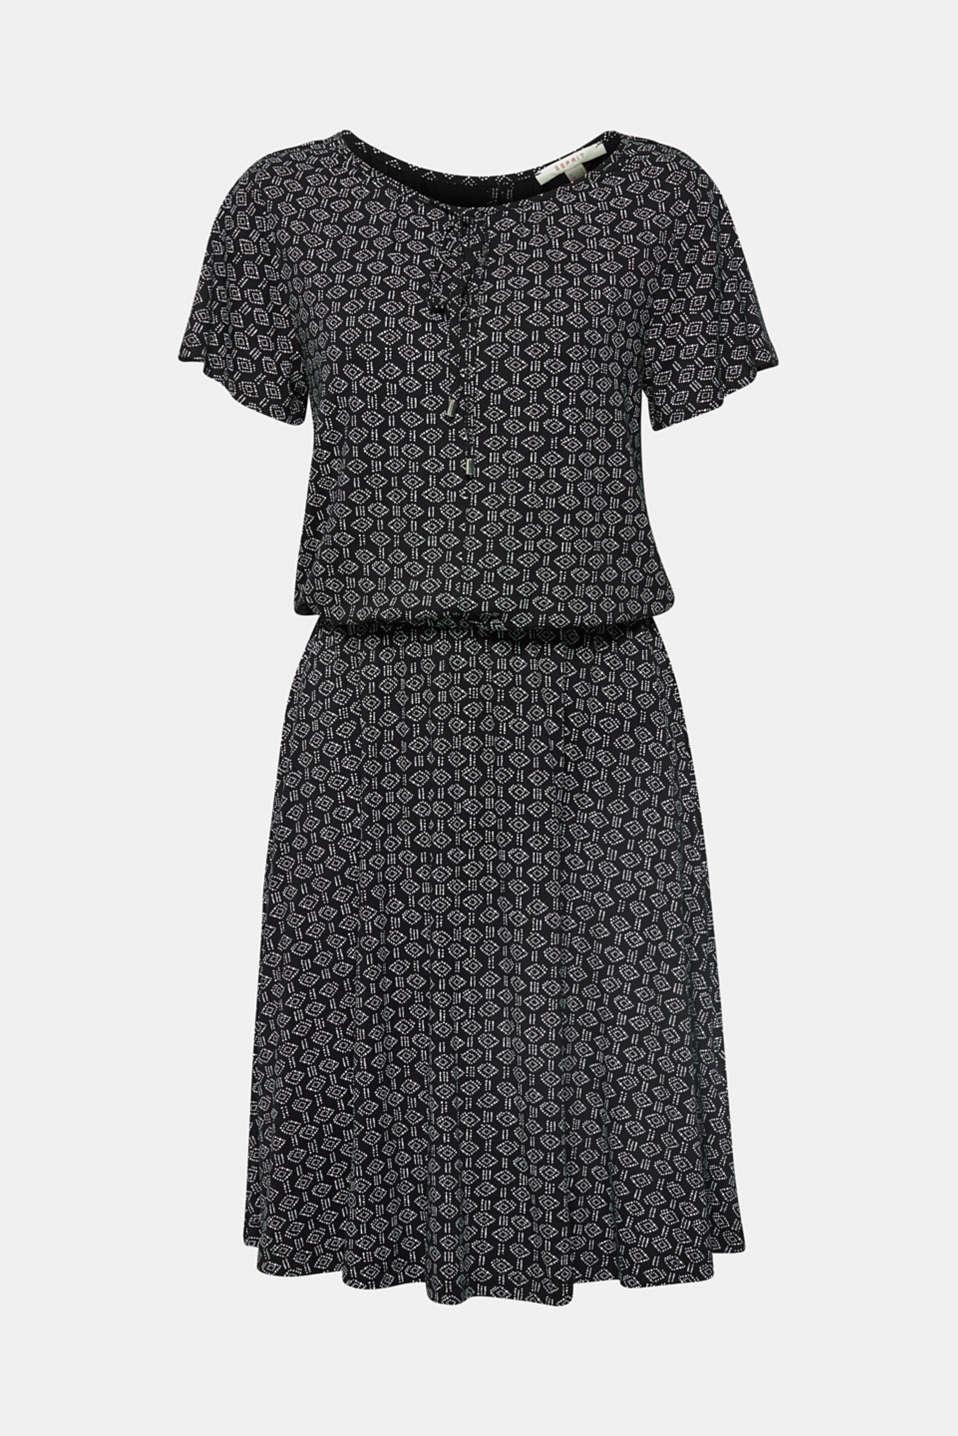 Dresses knitted, BLACK, detail image number 7